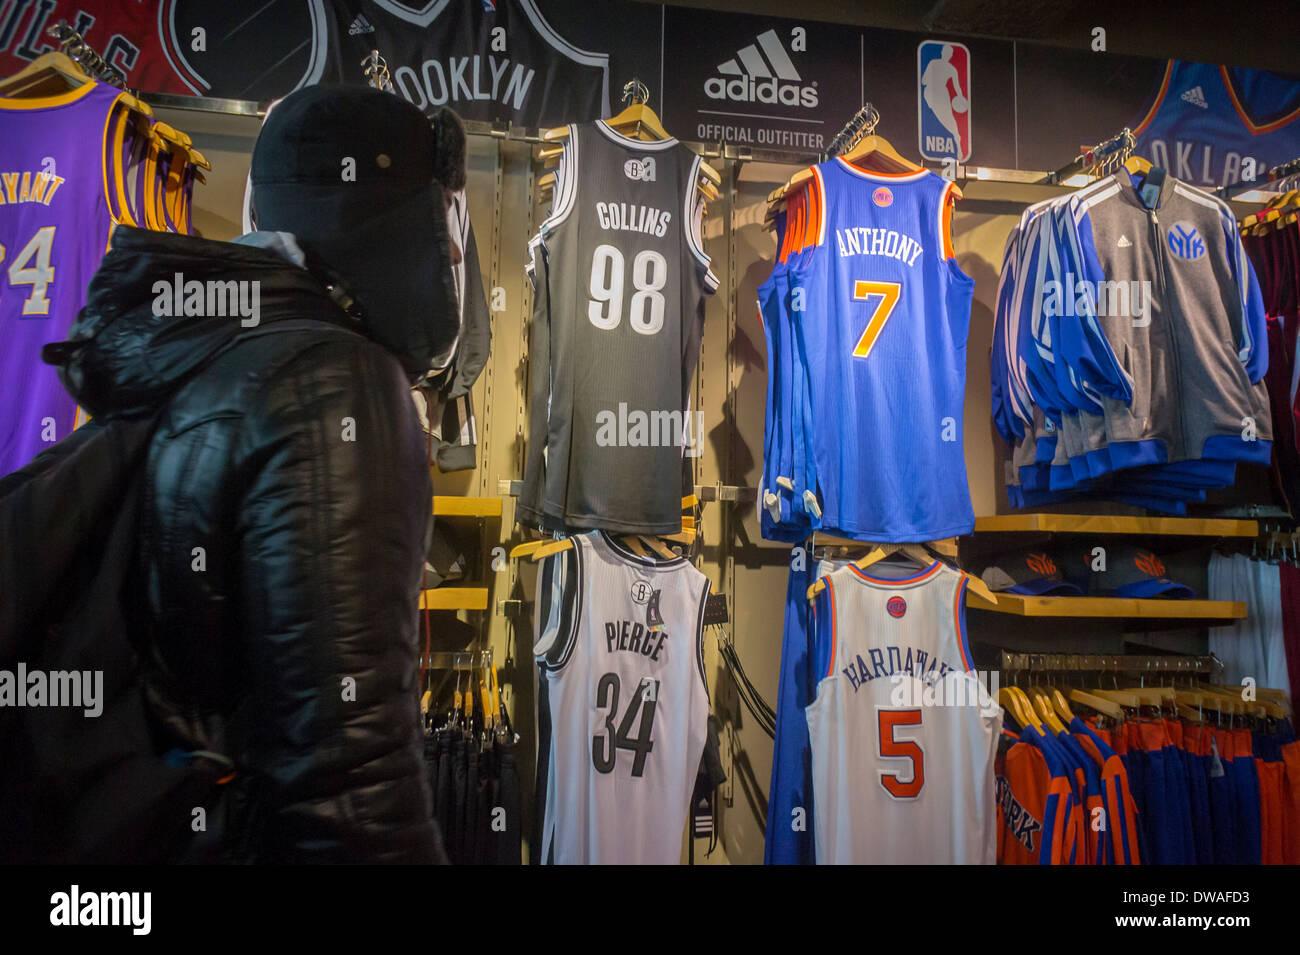 1a5717d4d82 Jason Collins' number 98 Brooklyn Nets basketball jersey is seen amongst  other players' uniforms